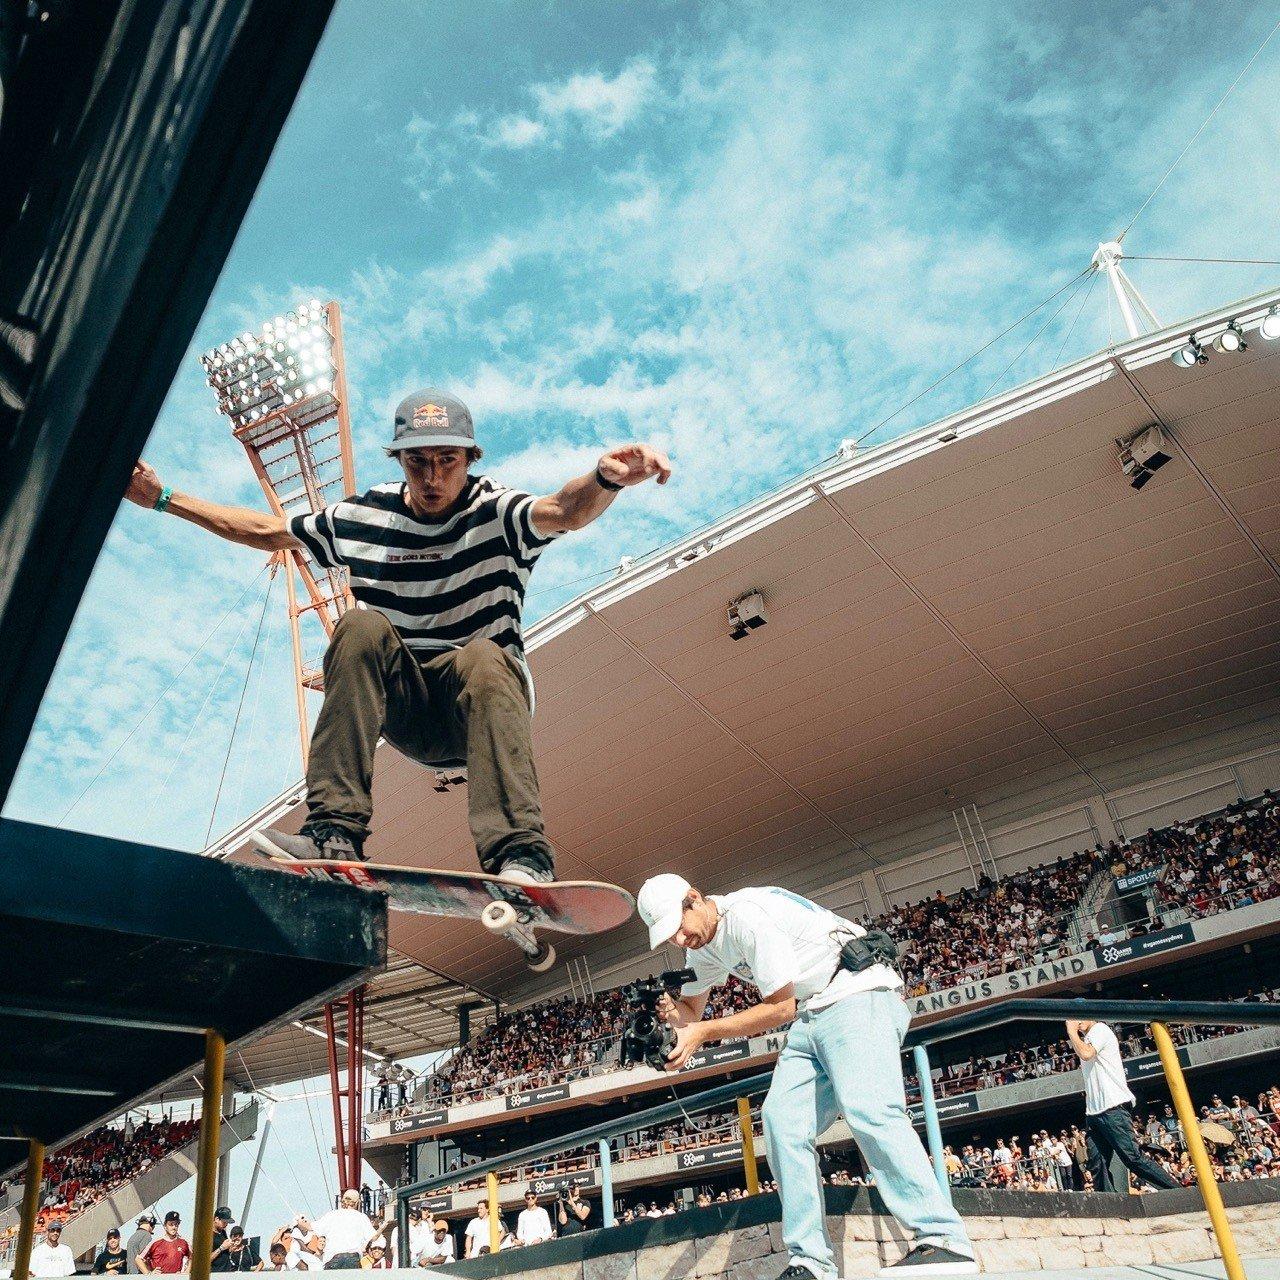 Rad Season Action Sports Adventure and Music Festivals